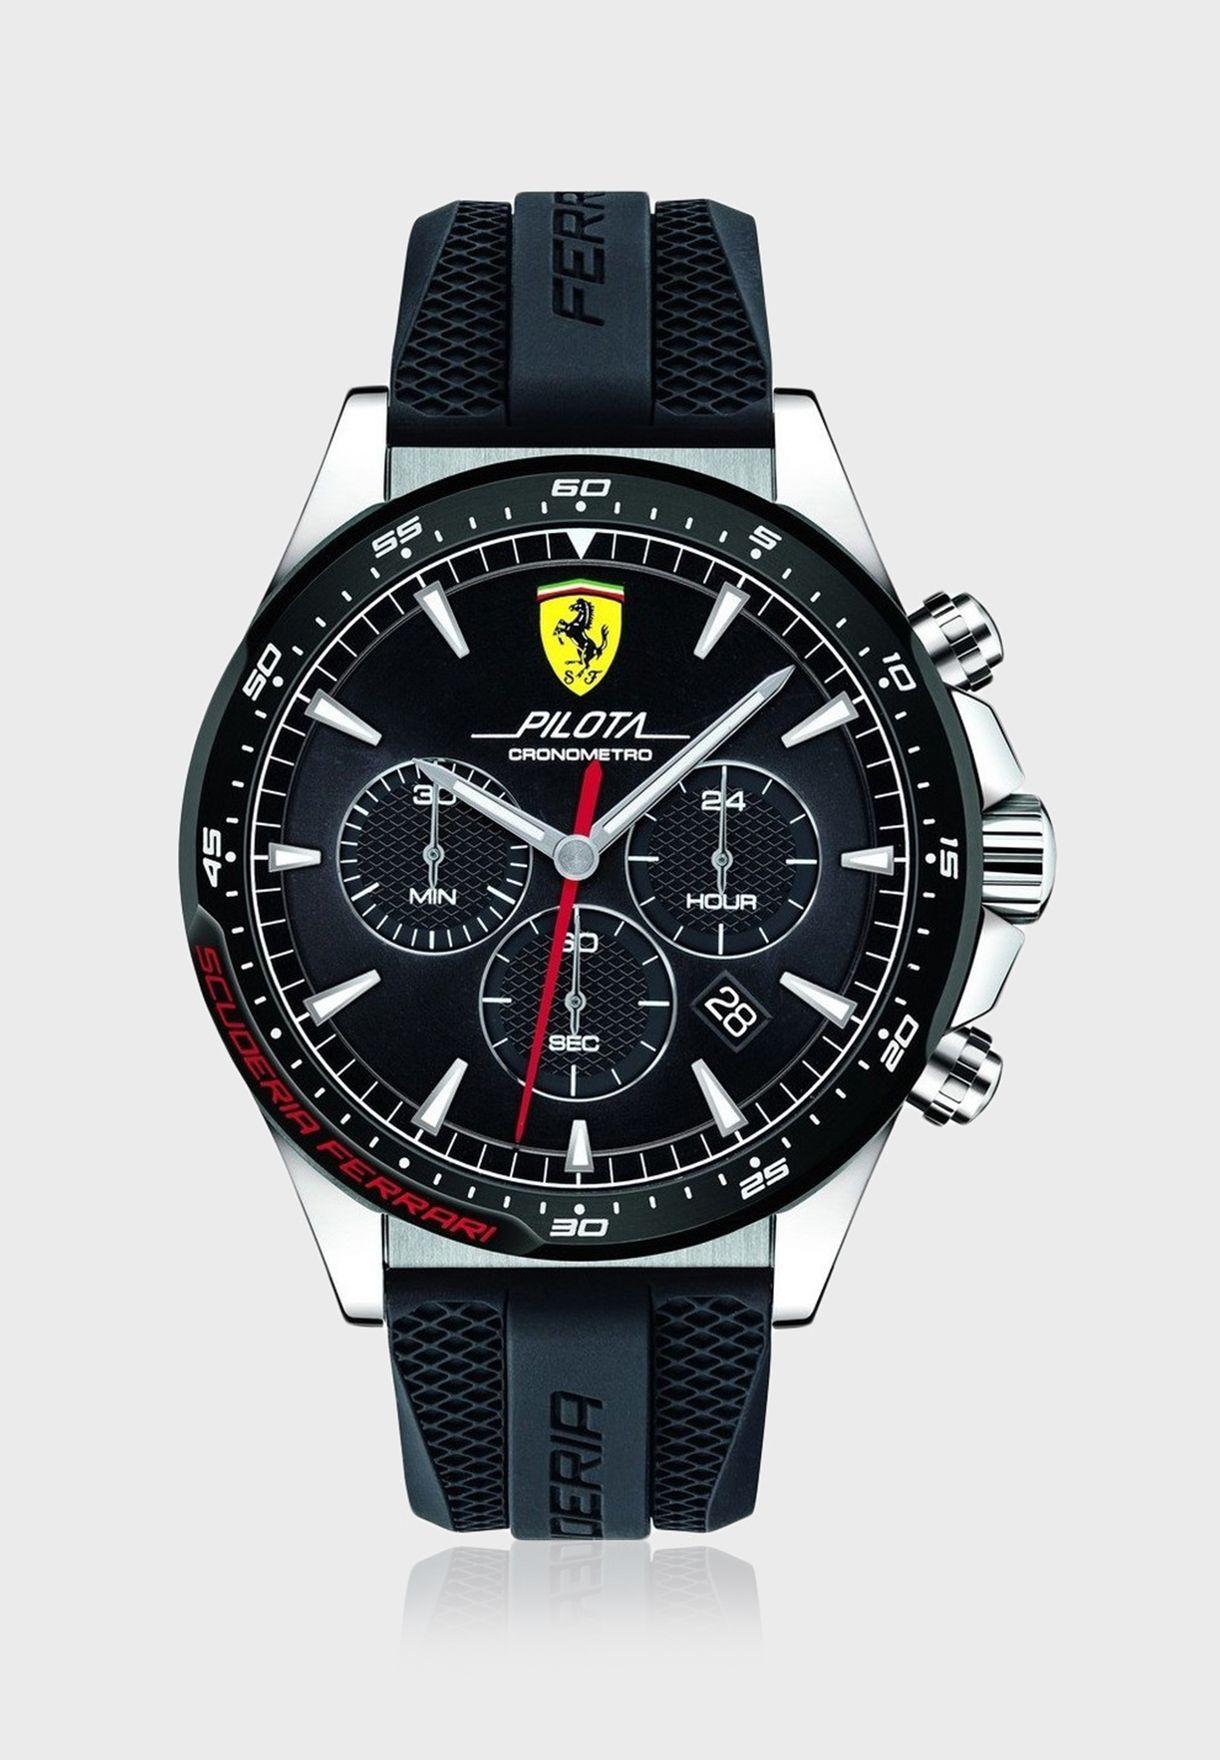 830620 Pilota Chronograph Watch